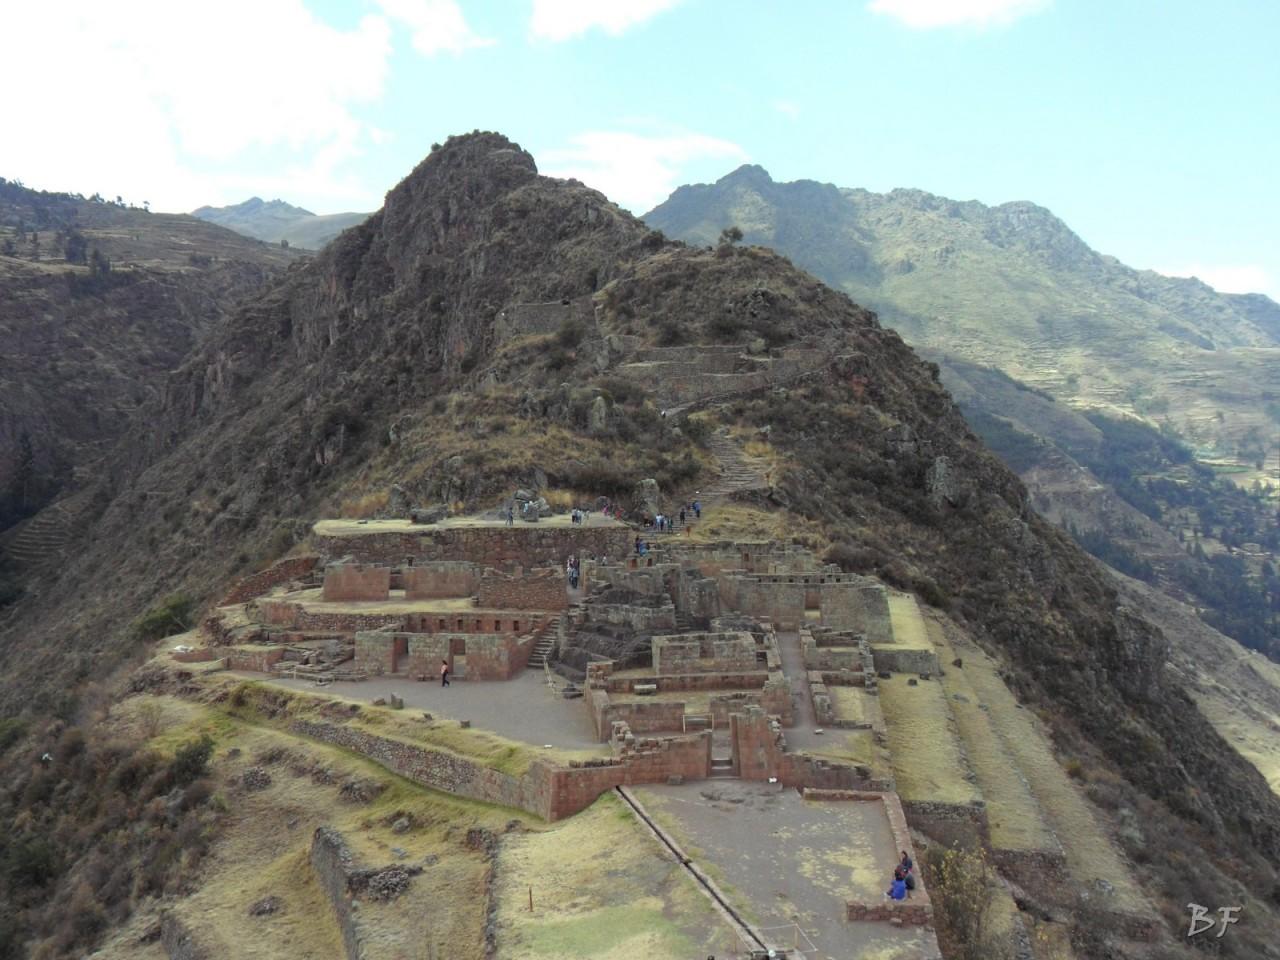 Mura-Poligonali-Megaliti-Altari-Rupestri-Pisac-Cusco-Perù-76